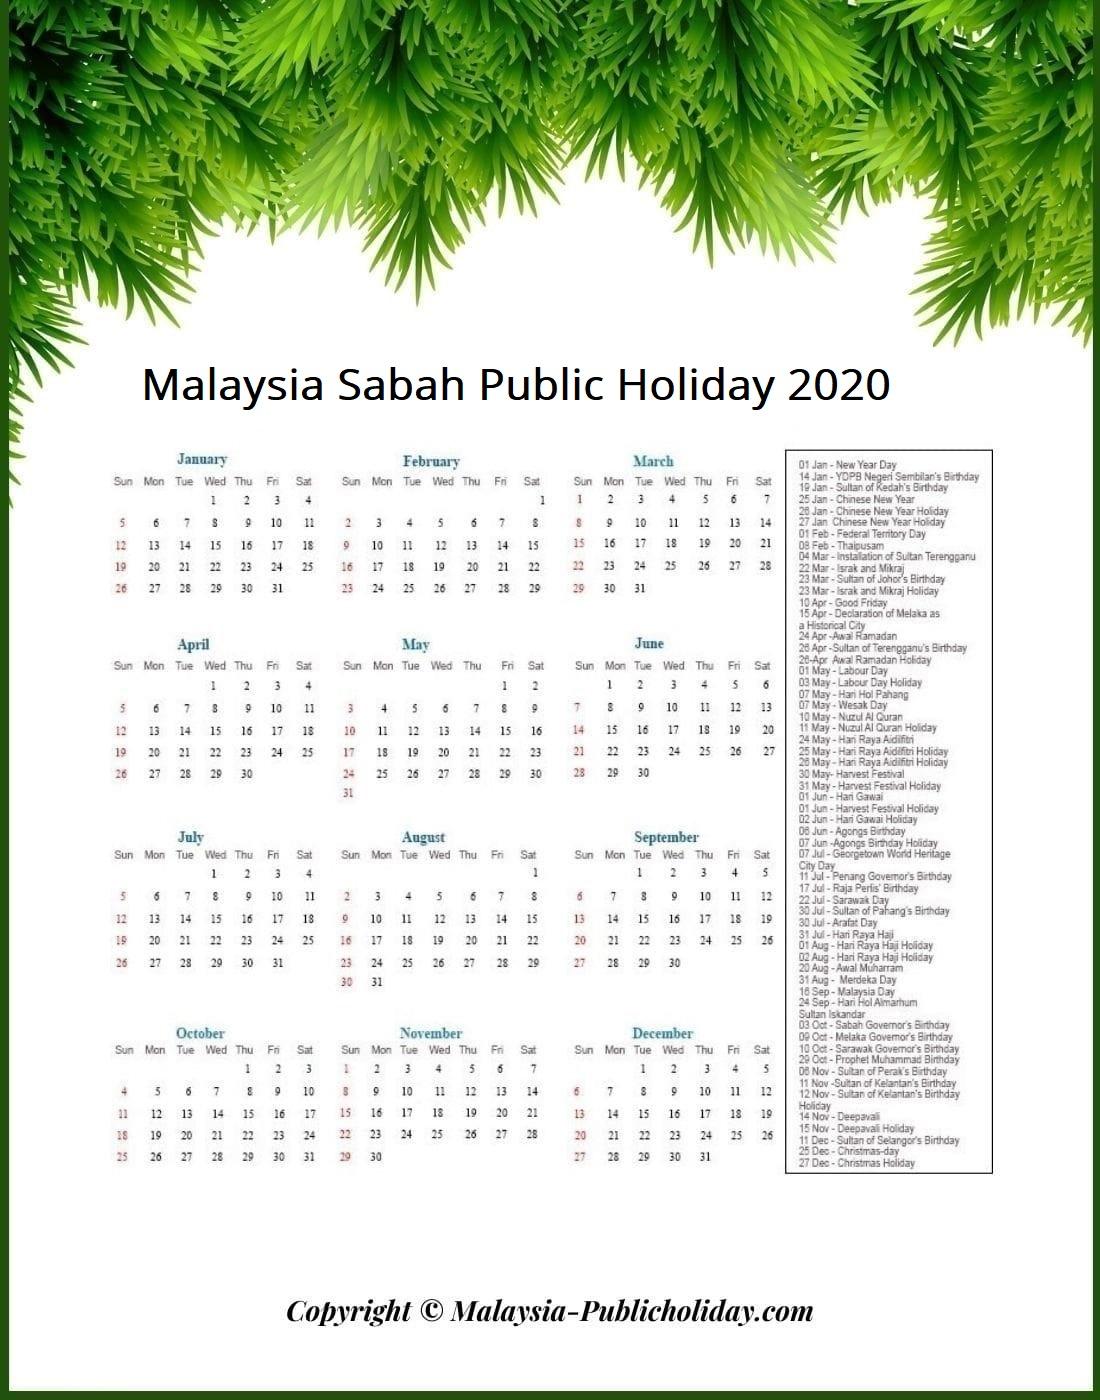 Sabah Holiday 2020 Malaysia